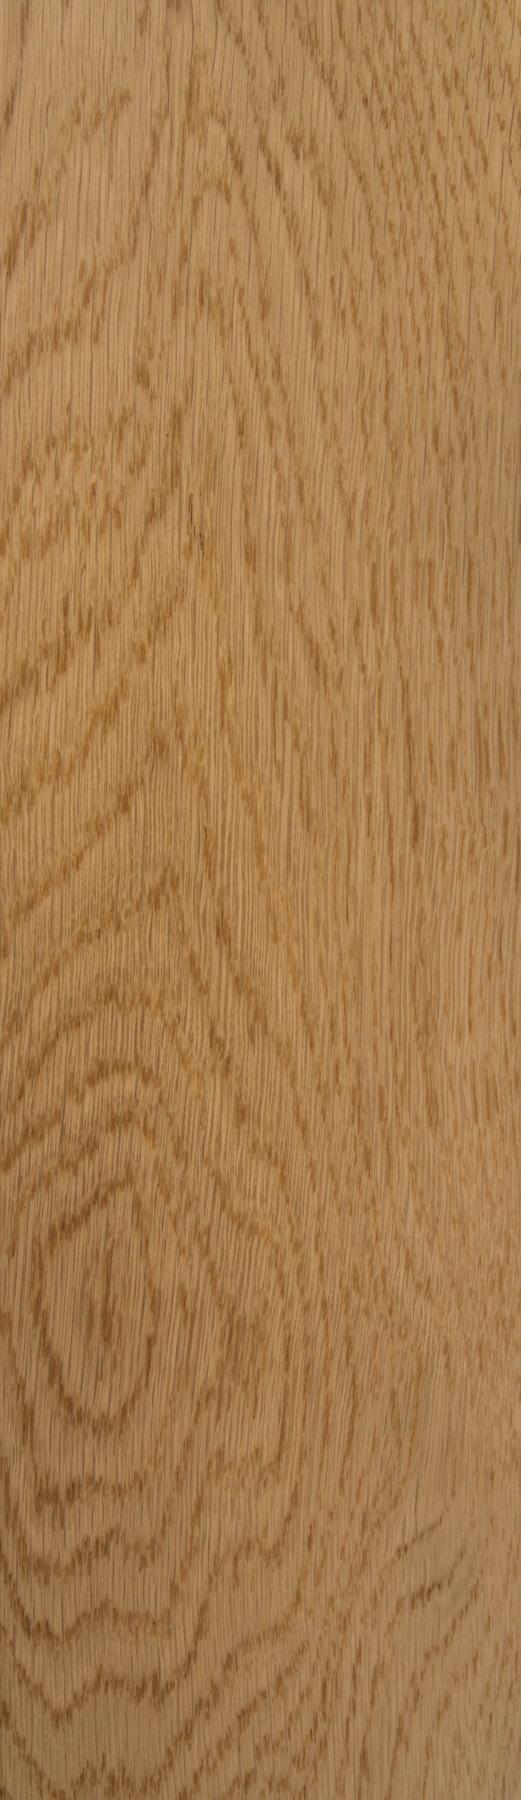 maderas-terramont-vitare-white-oak